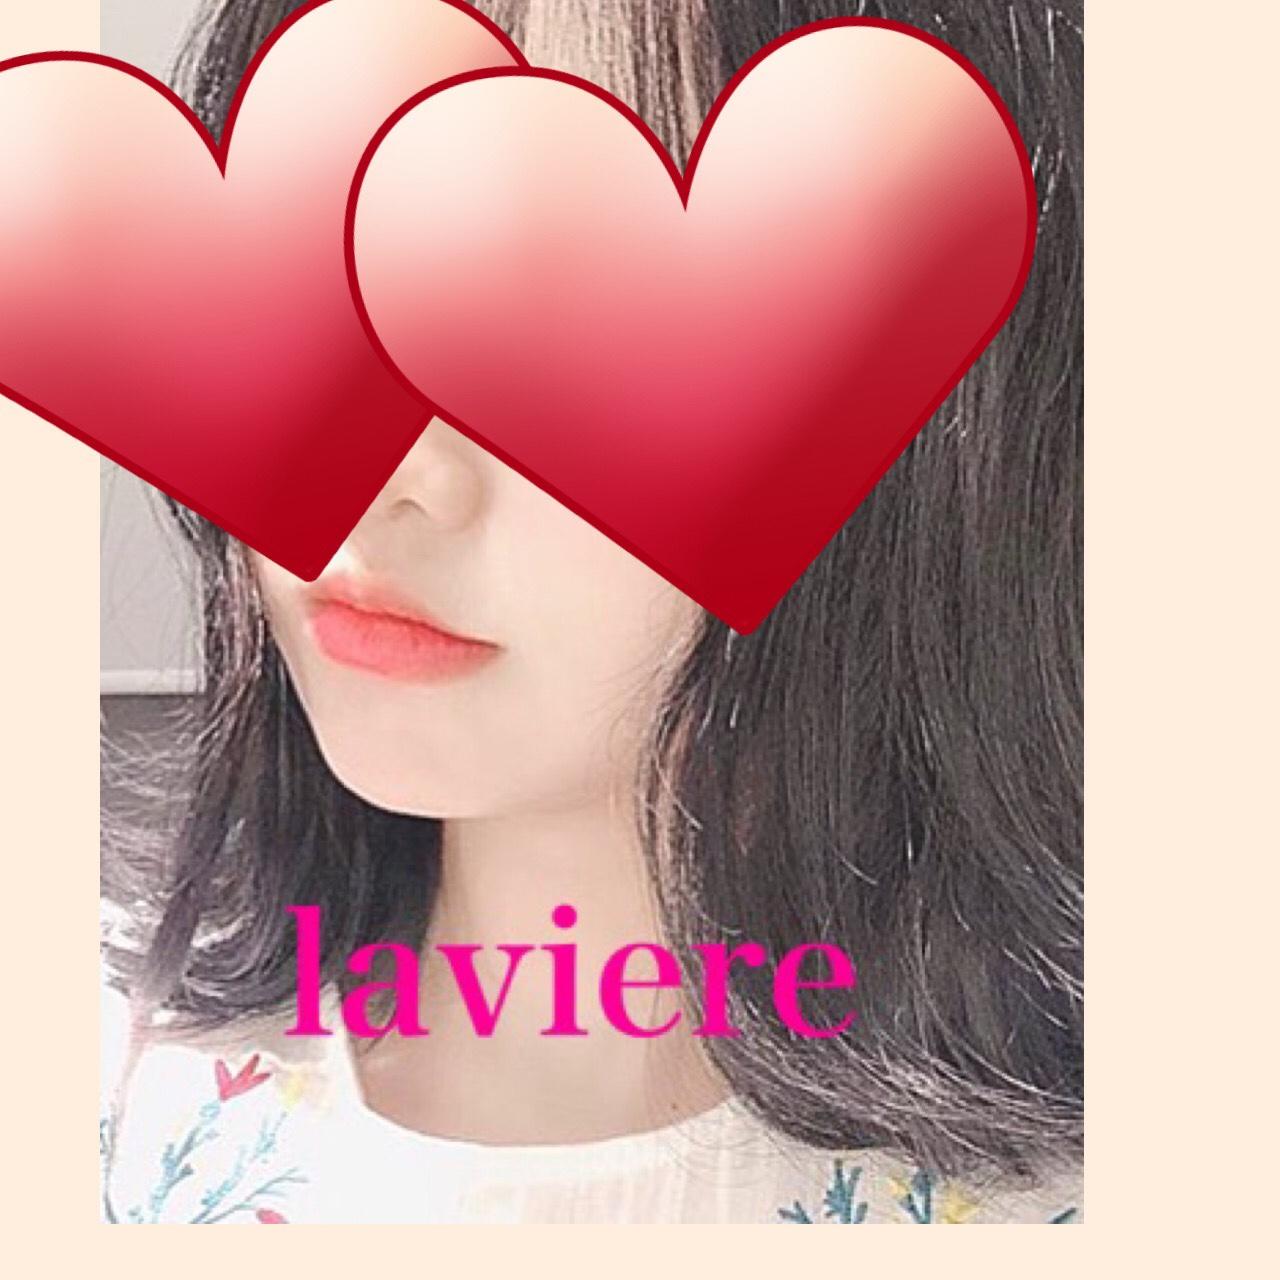 fc2blog_201811050210259ef.jpg